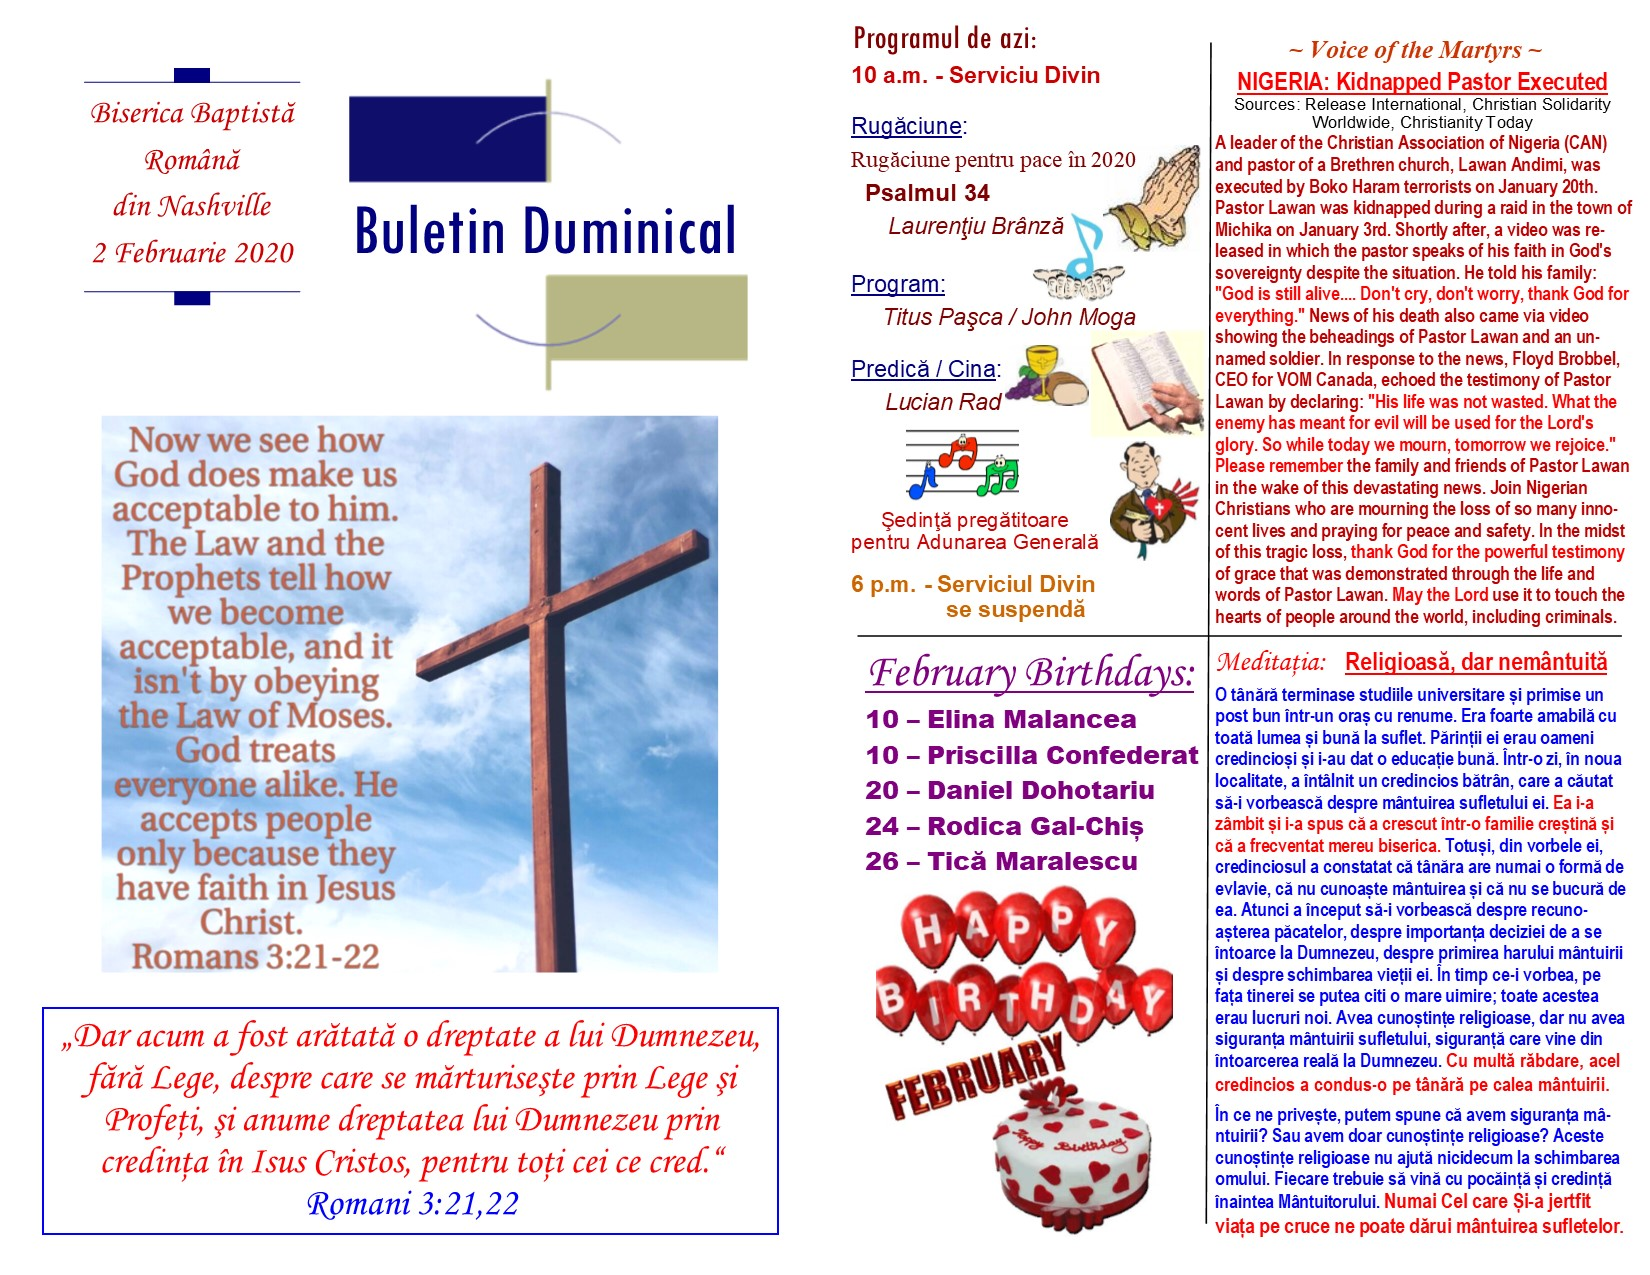 Buletin 02-02-20 page 1 & 2